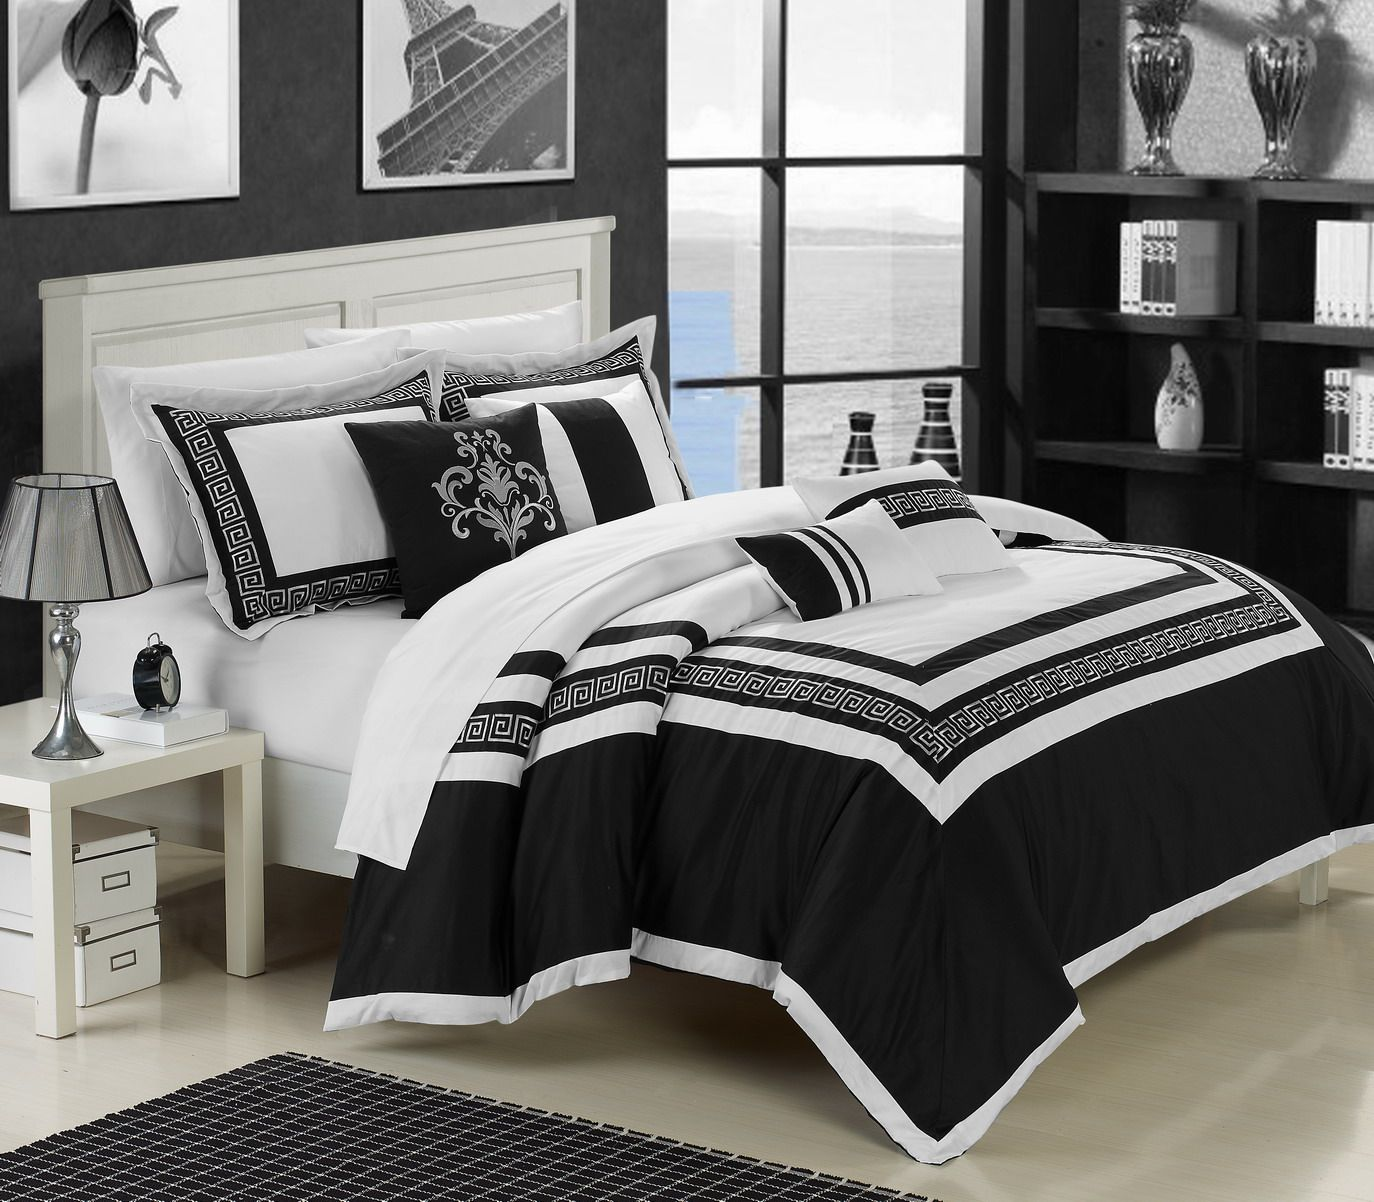 Robot Check White Bed Set Bedding Sets White Bedding Black and white sheet set